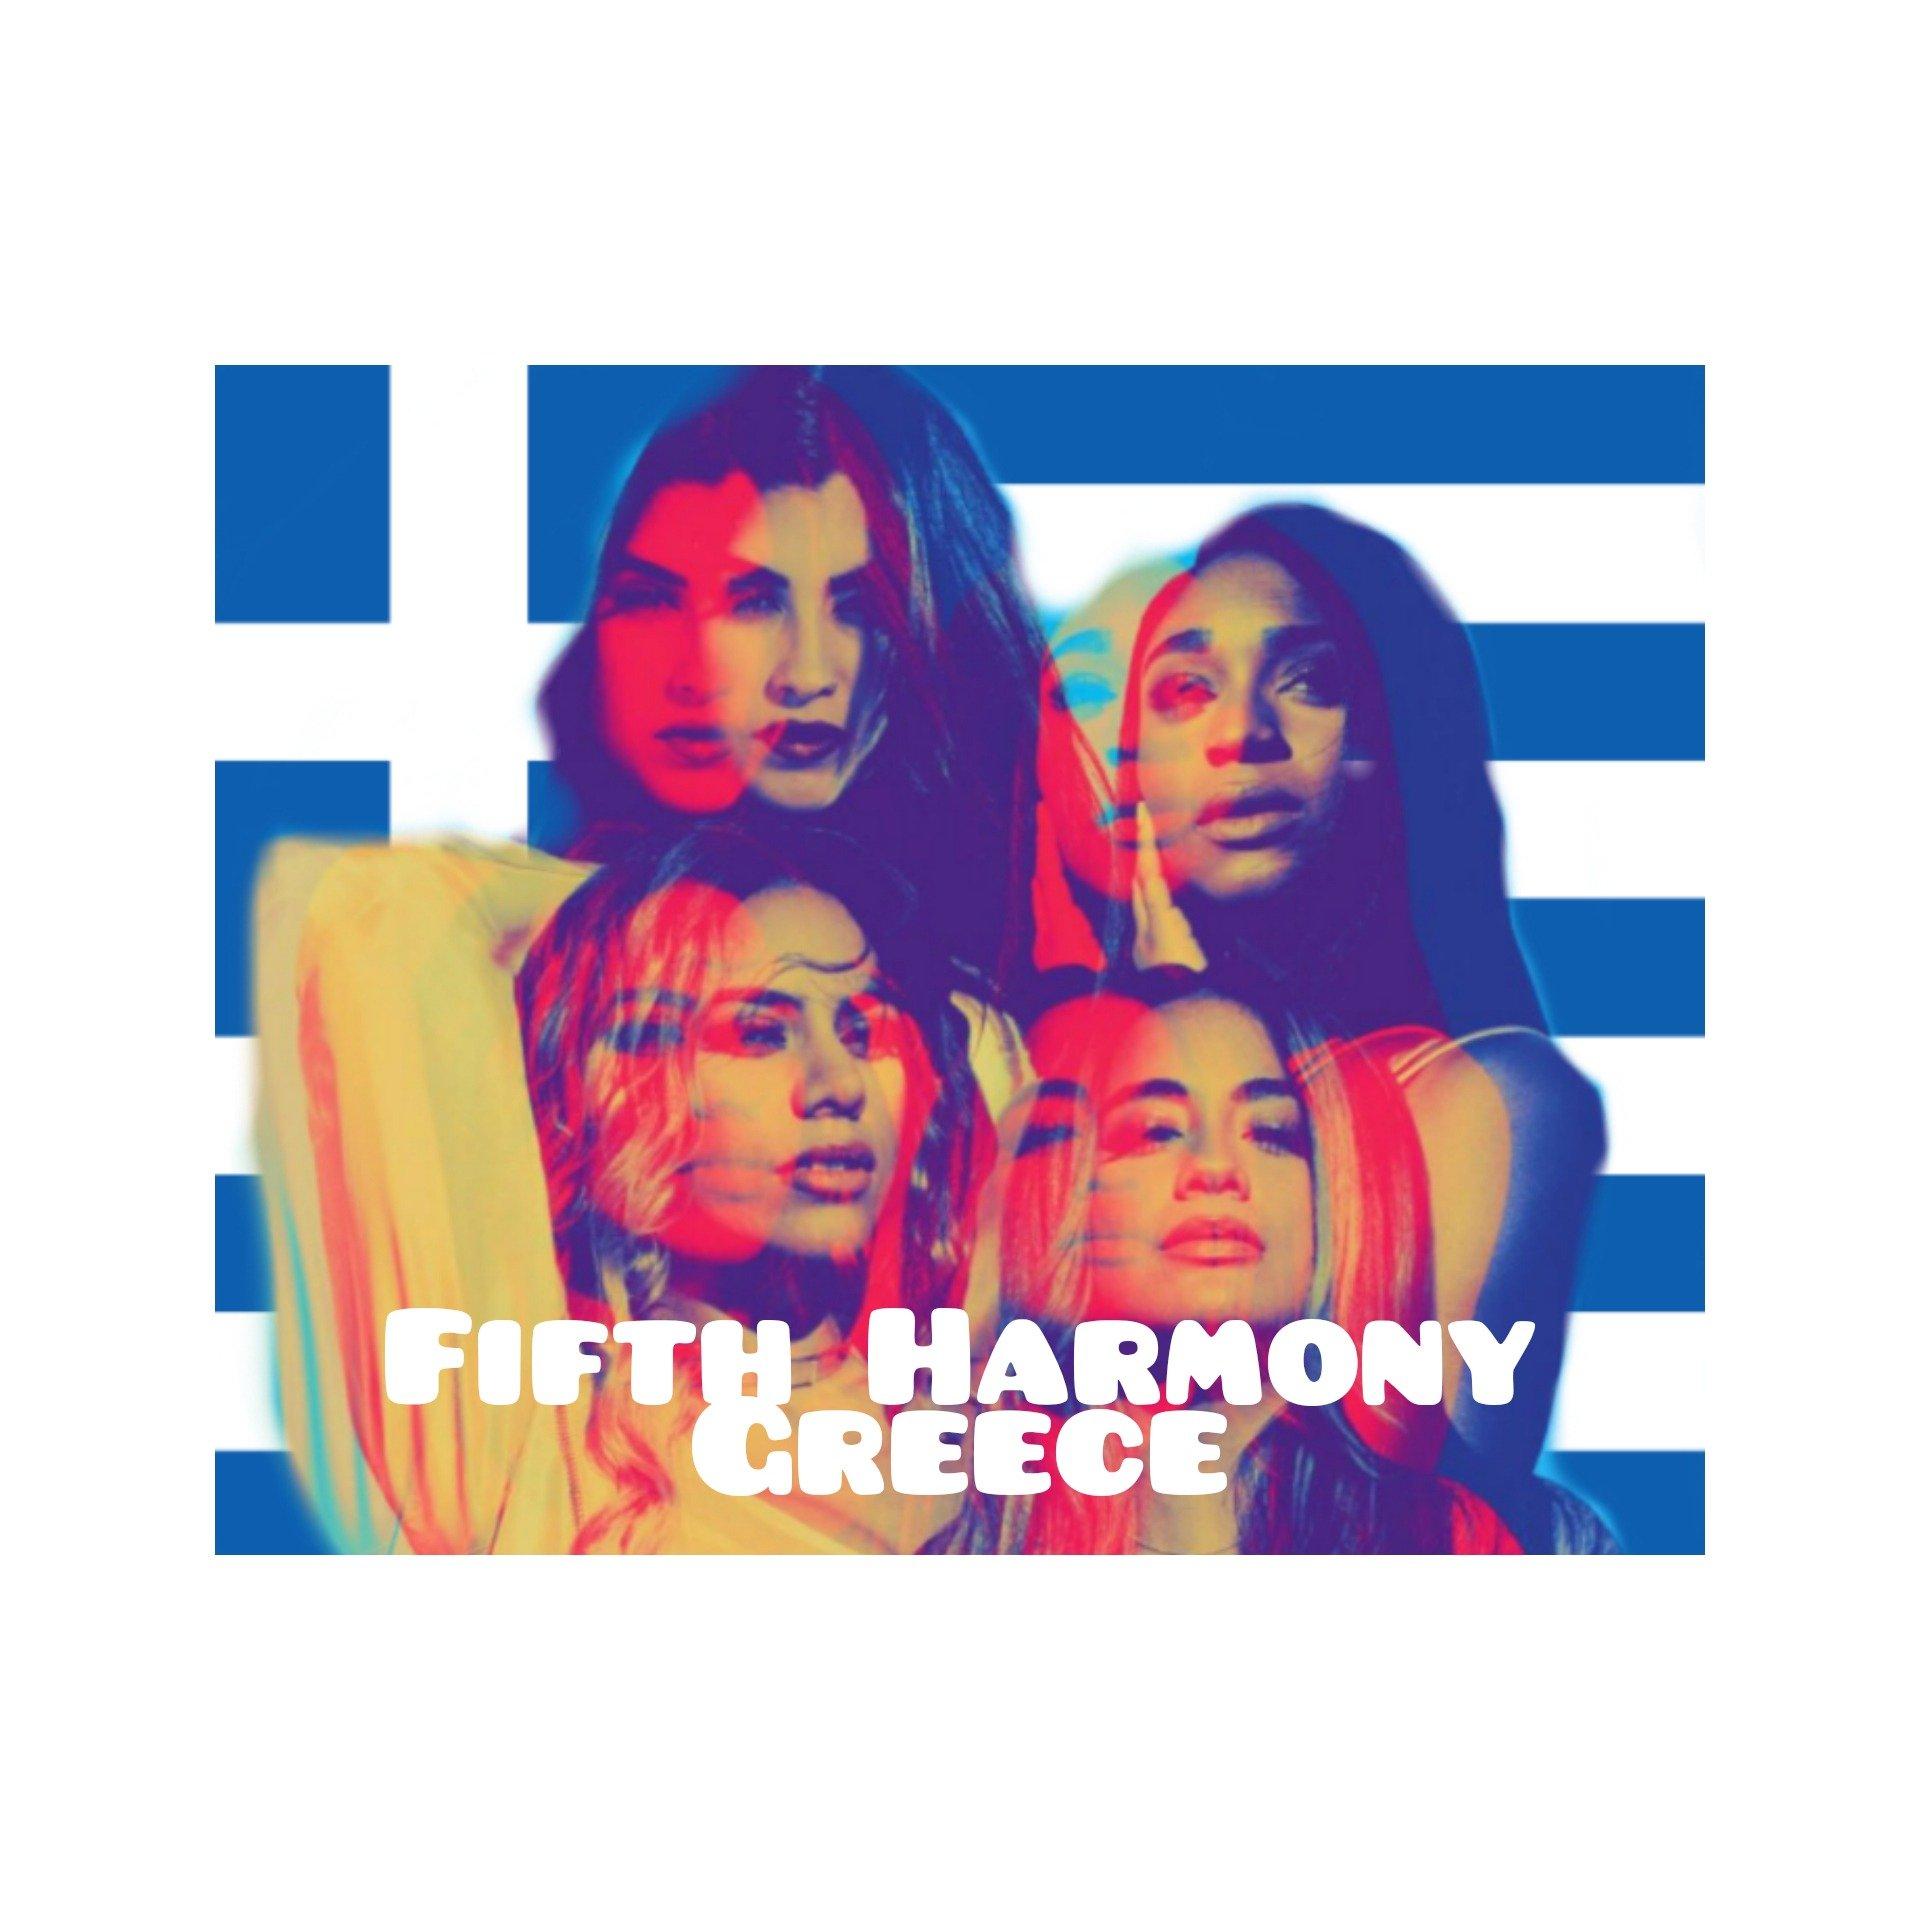 24ab586e4637 Fifth Harmony Greece on Twitter